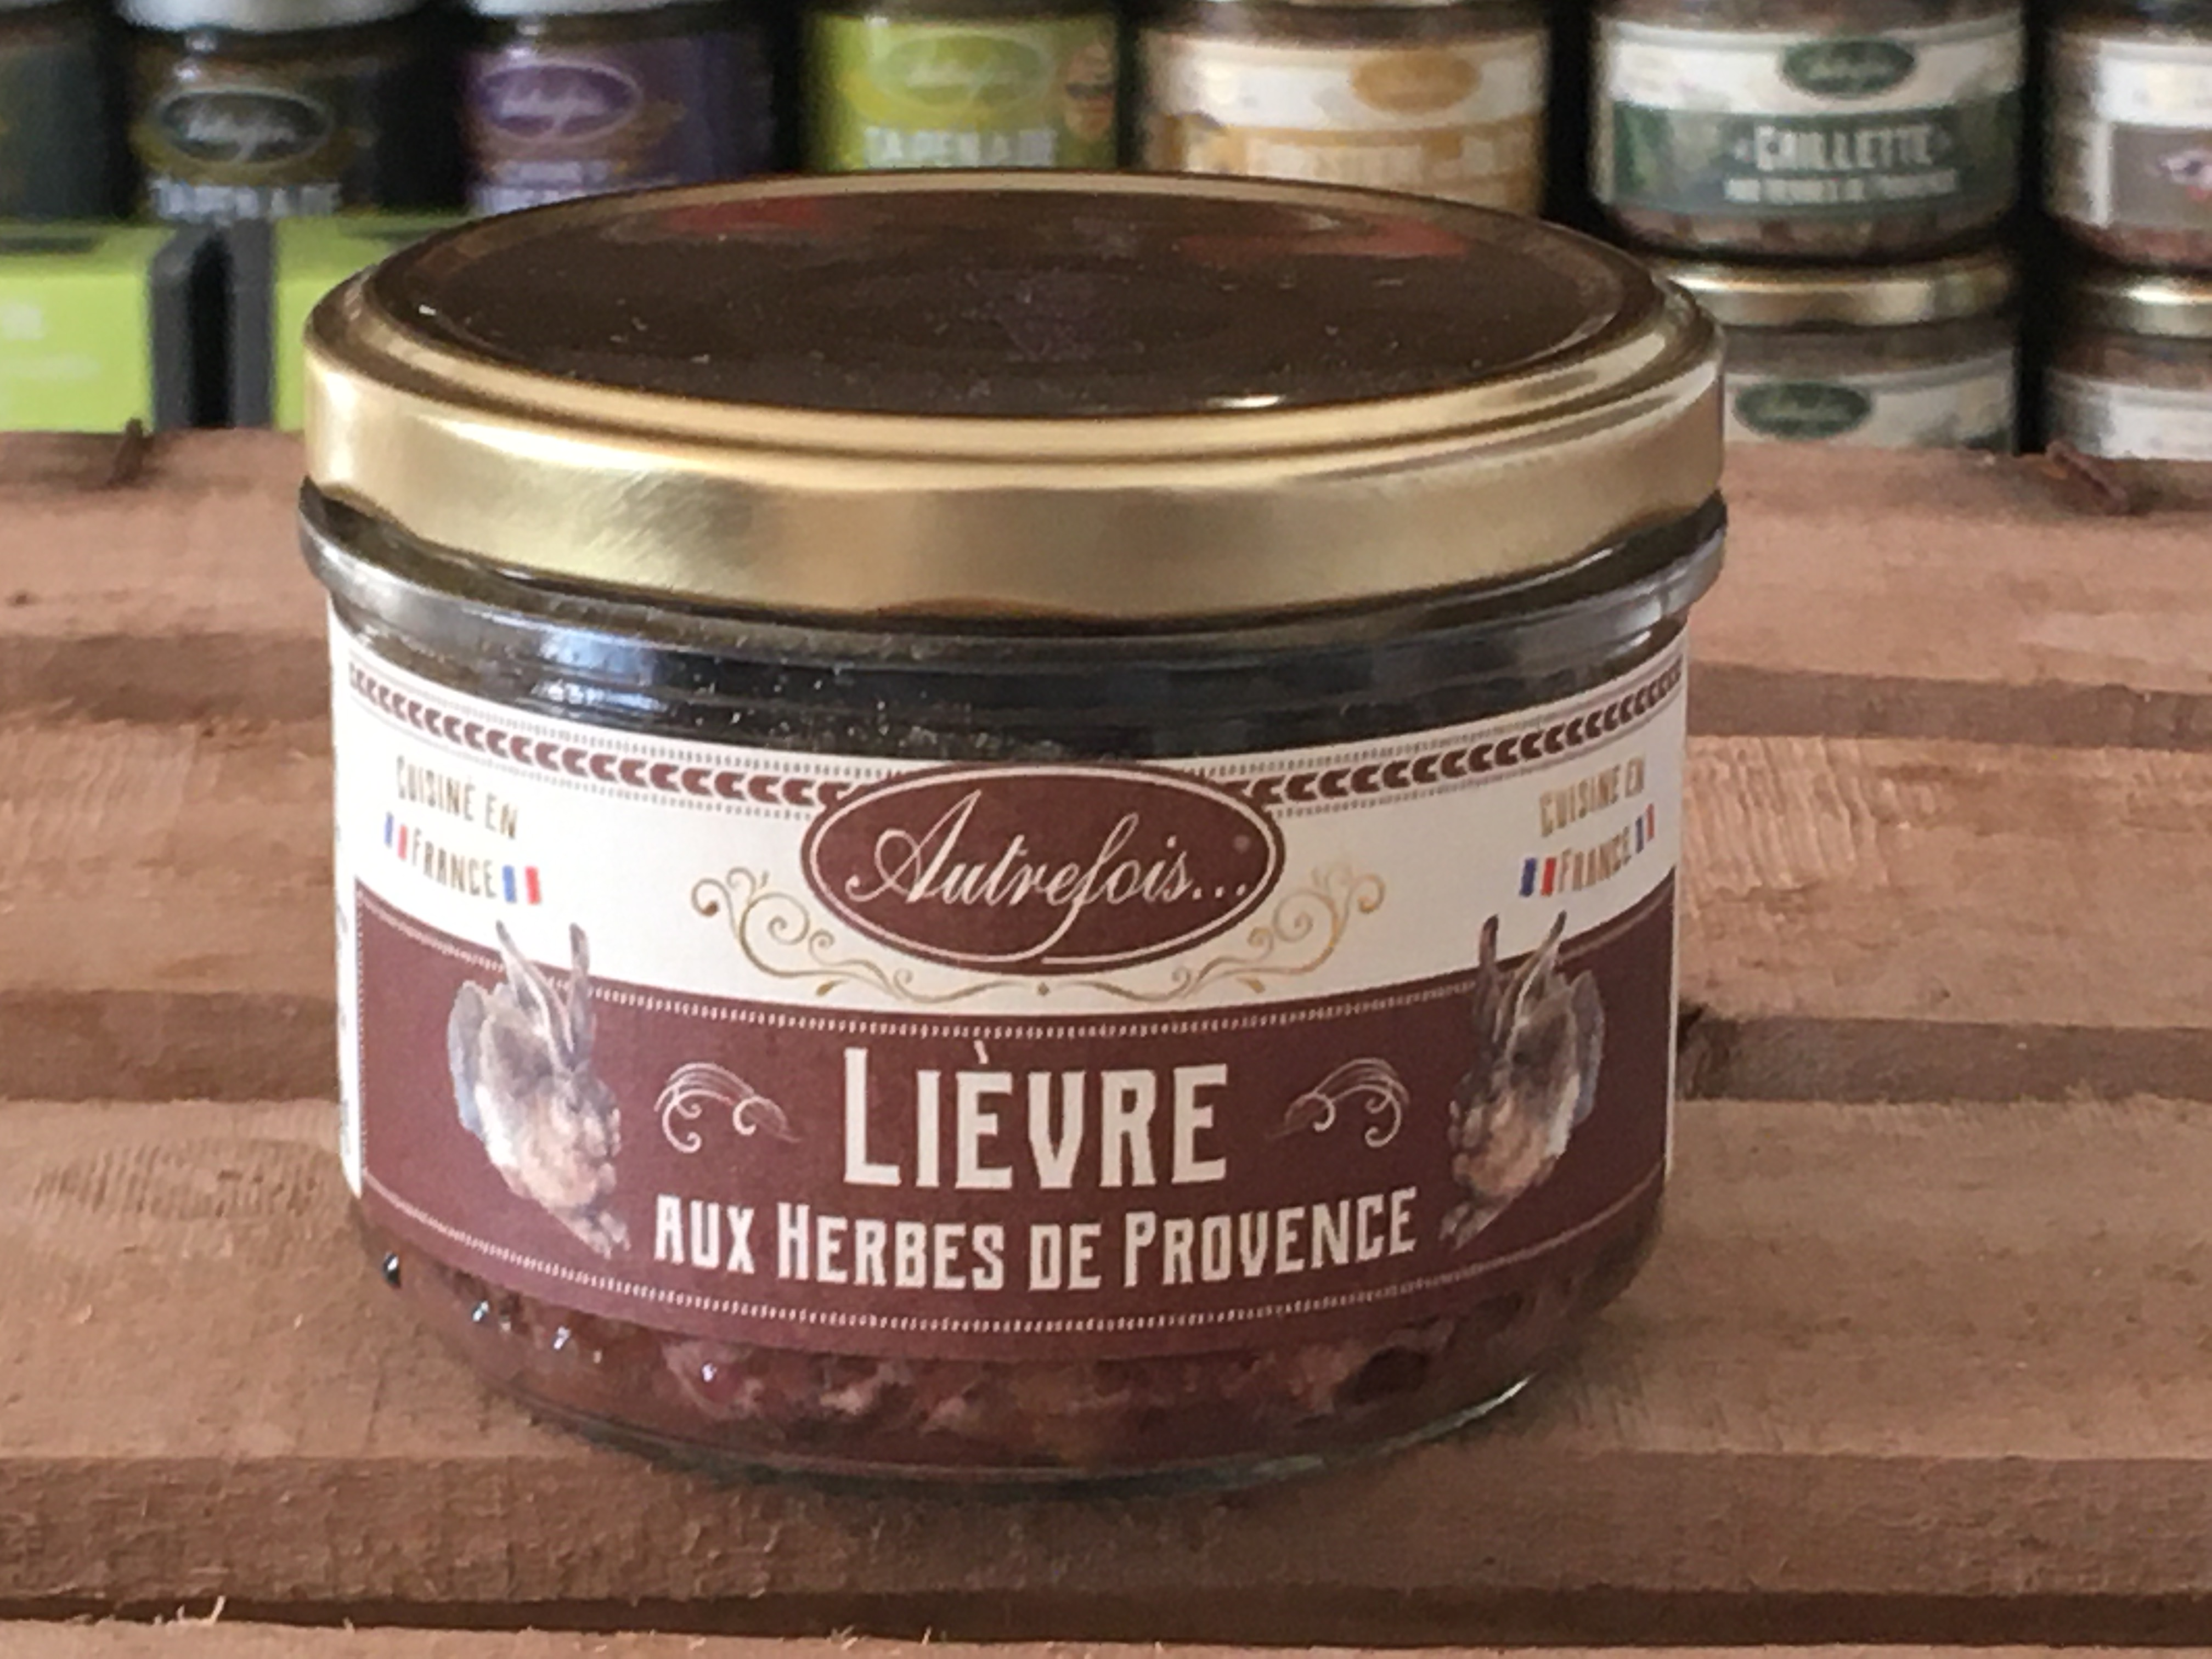 LIEVRE HERBES PROVENCE 180g Autrefois Terroir Milhaud Gard